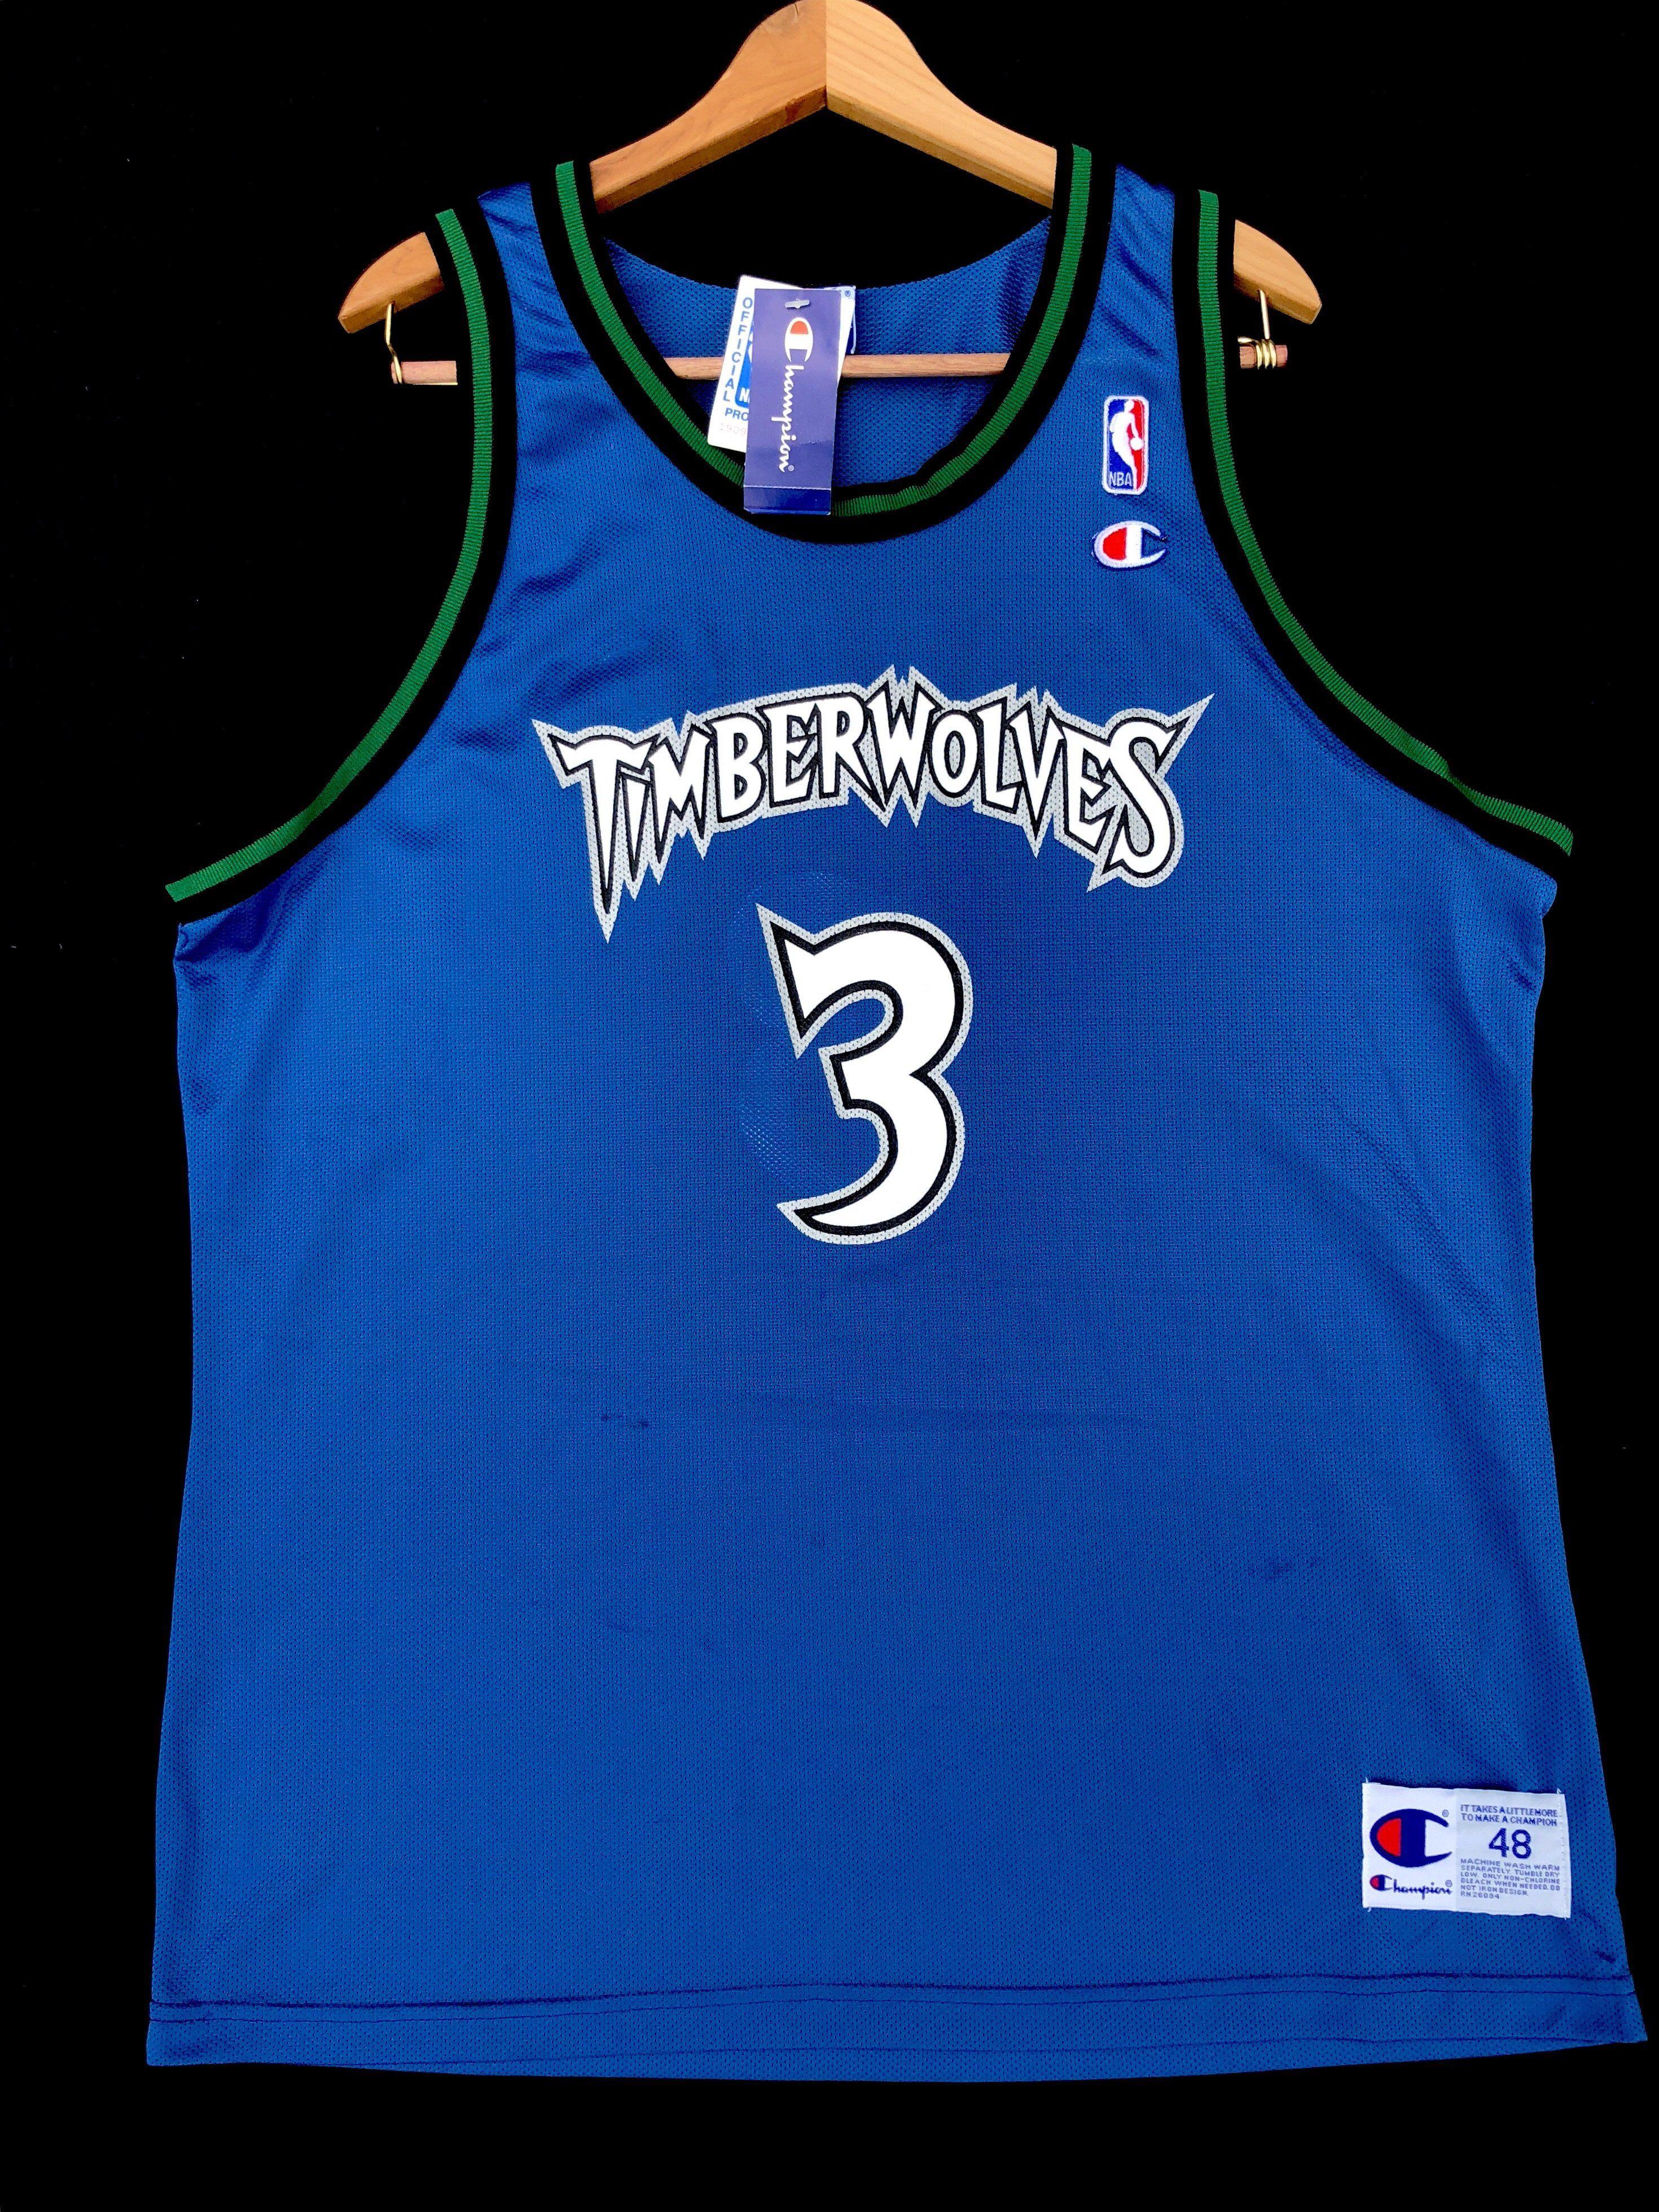 47b173bc395 Stephon Marbury Minnesota Timberwolves Vintage Champion Jersey 48 ...